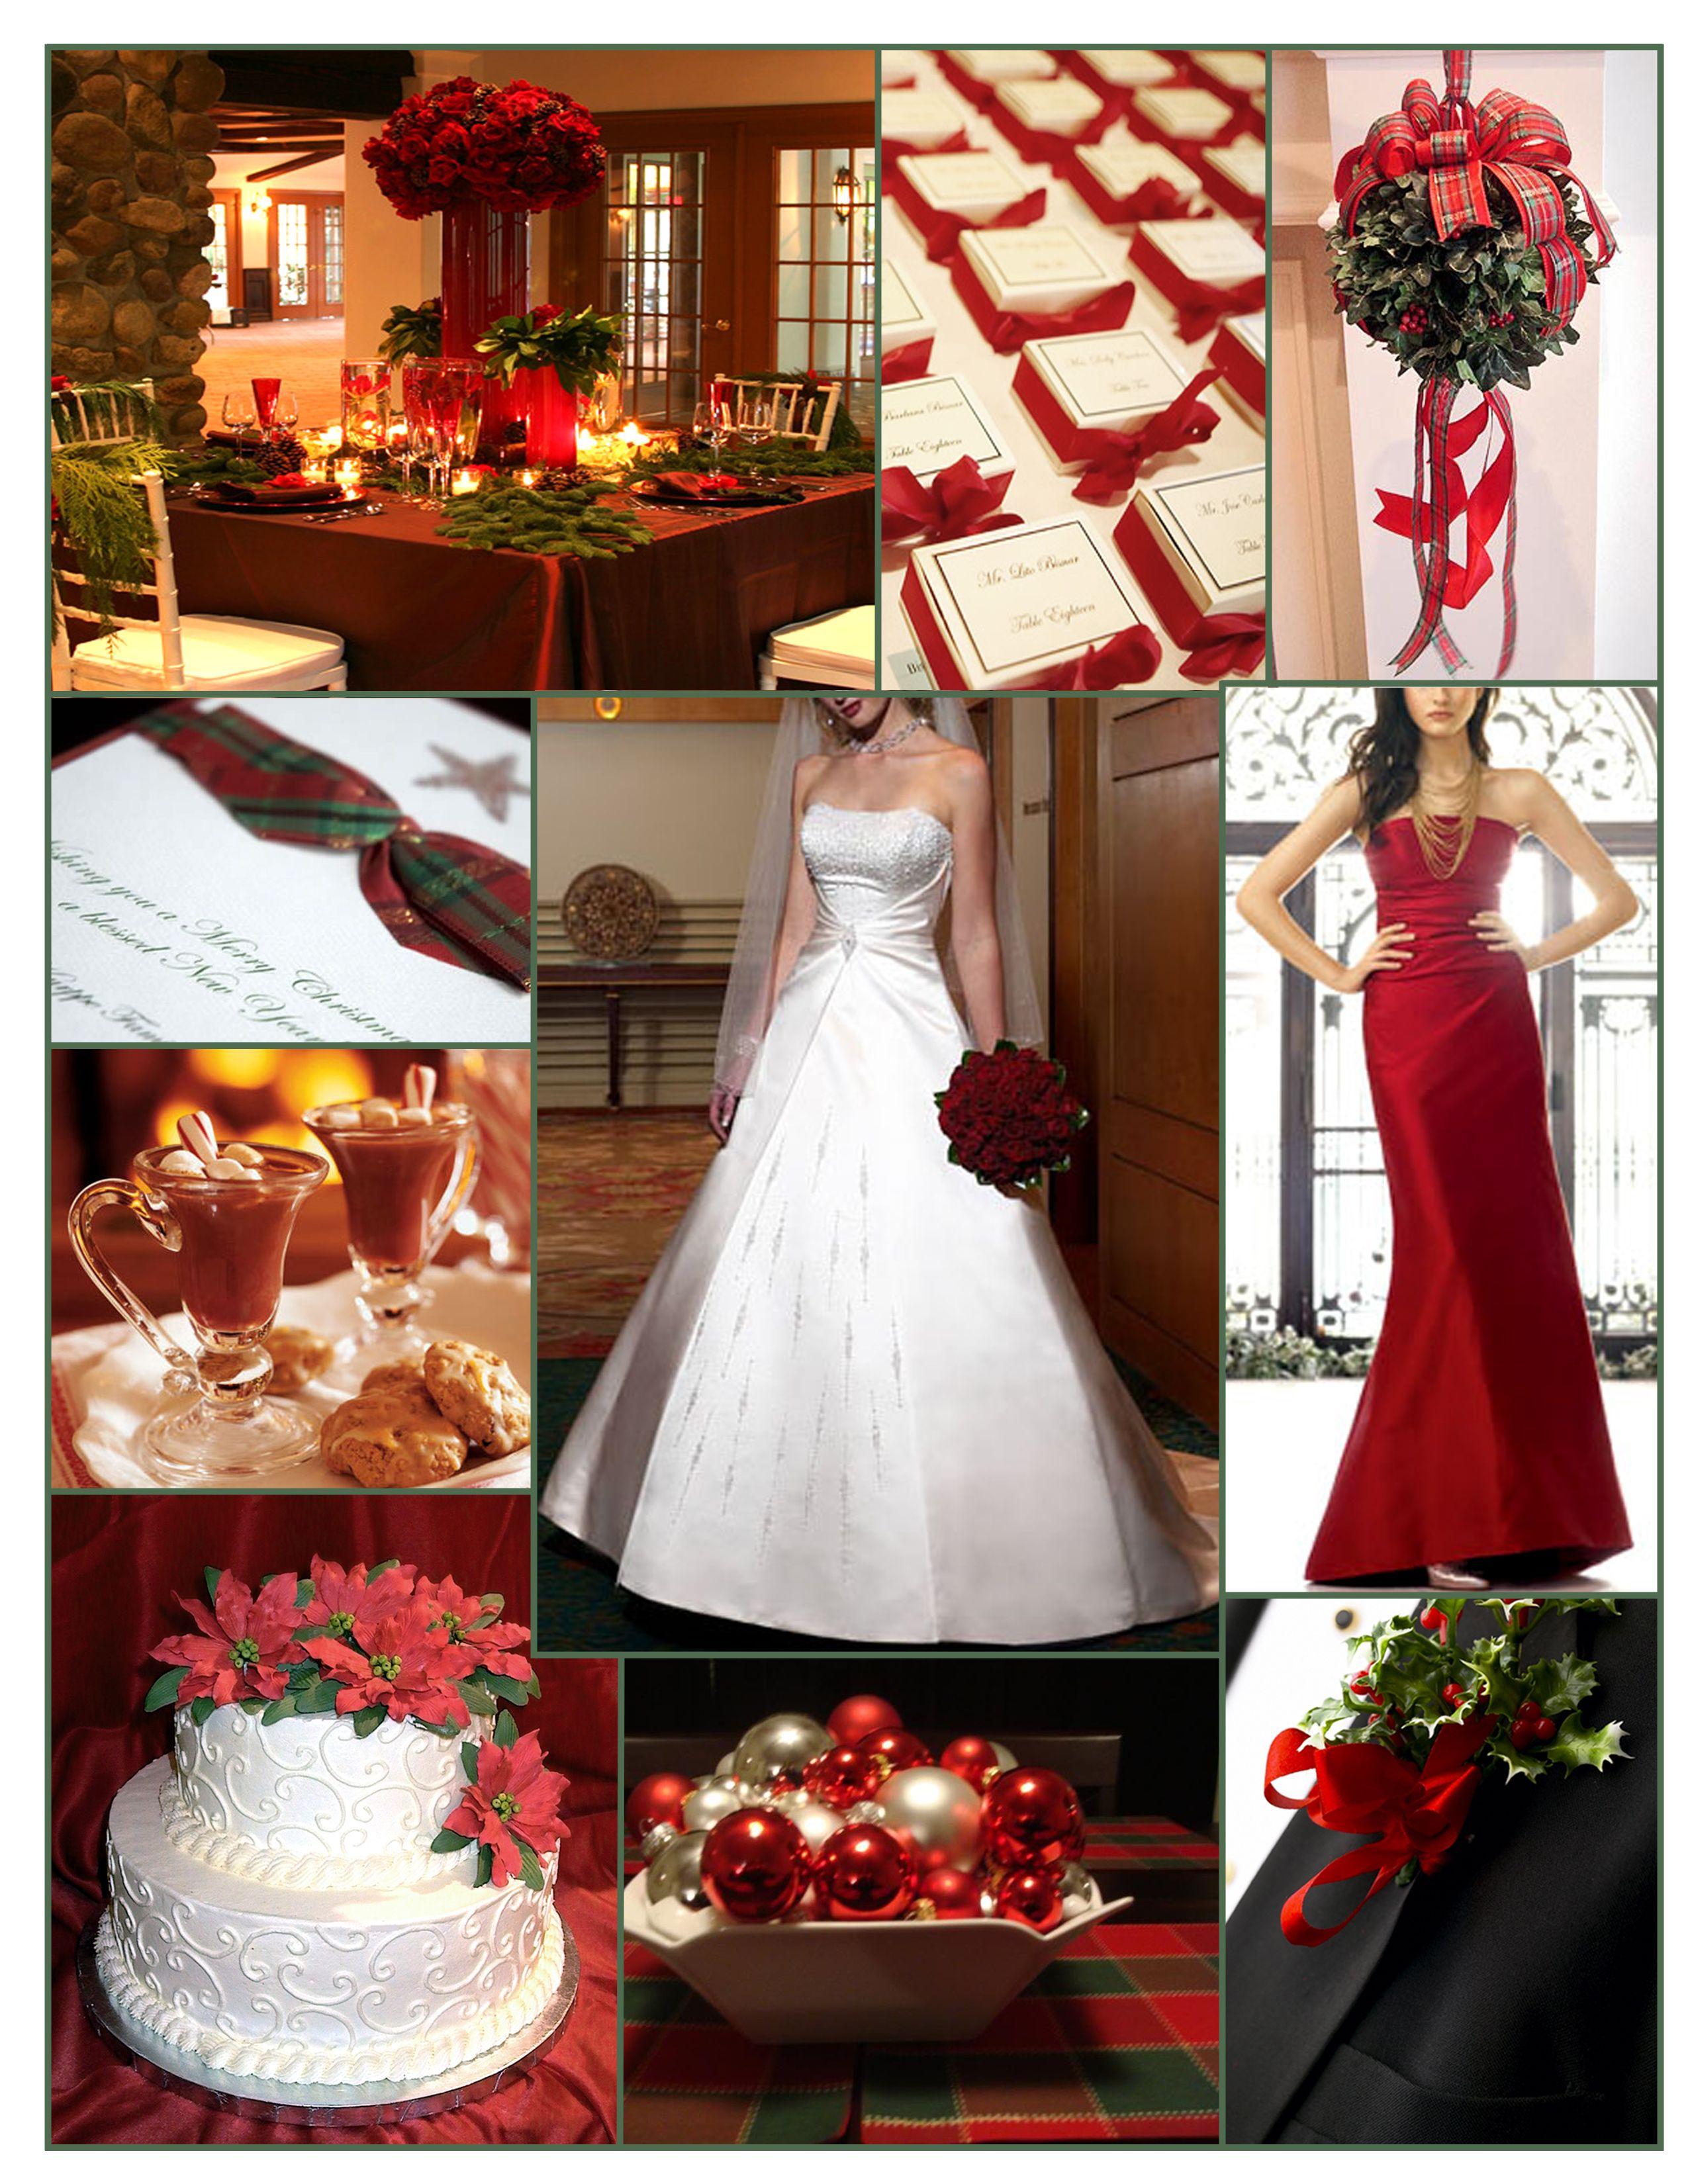 Christmas themed wedding inspiration  Our Christmas Wedding  Christmas Wedding Wedding gowns